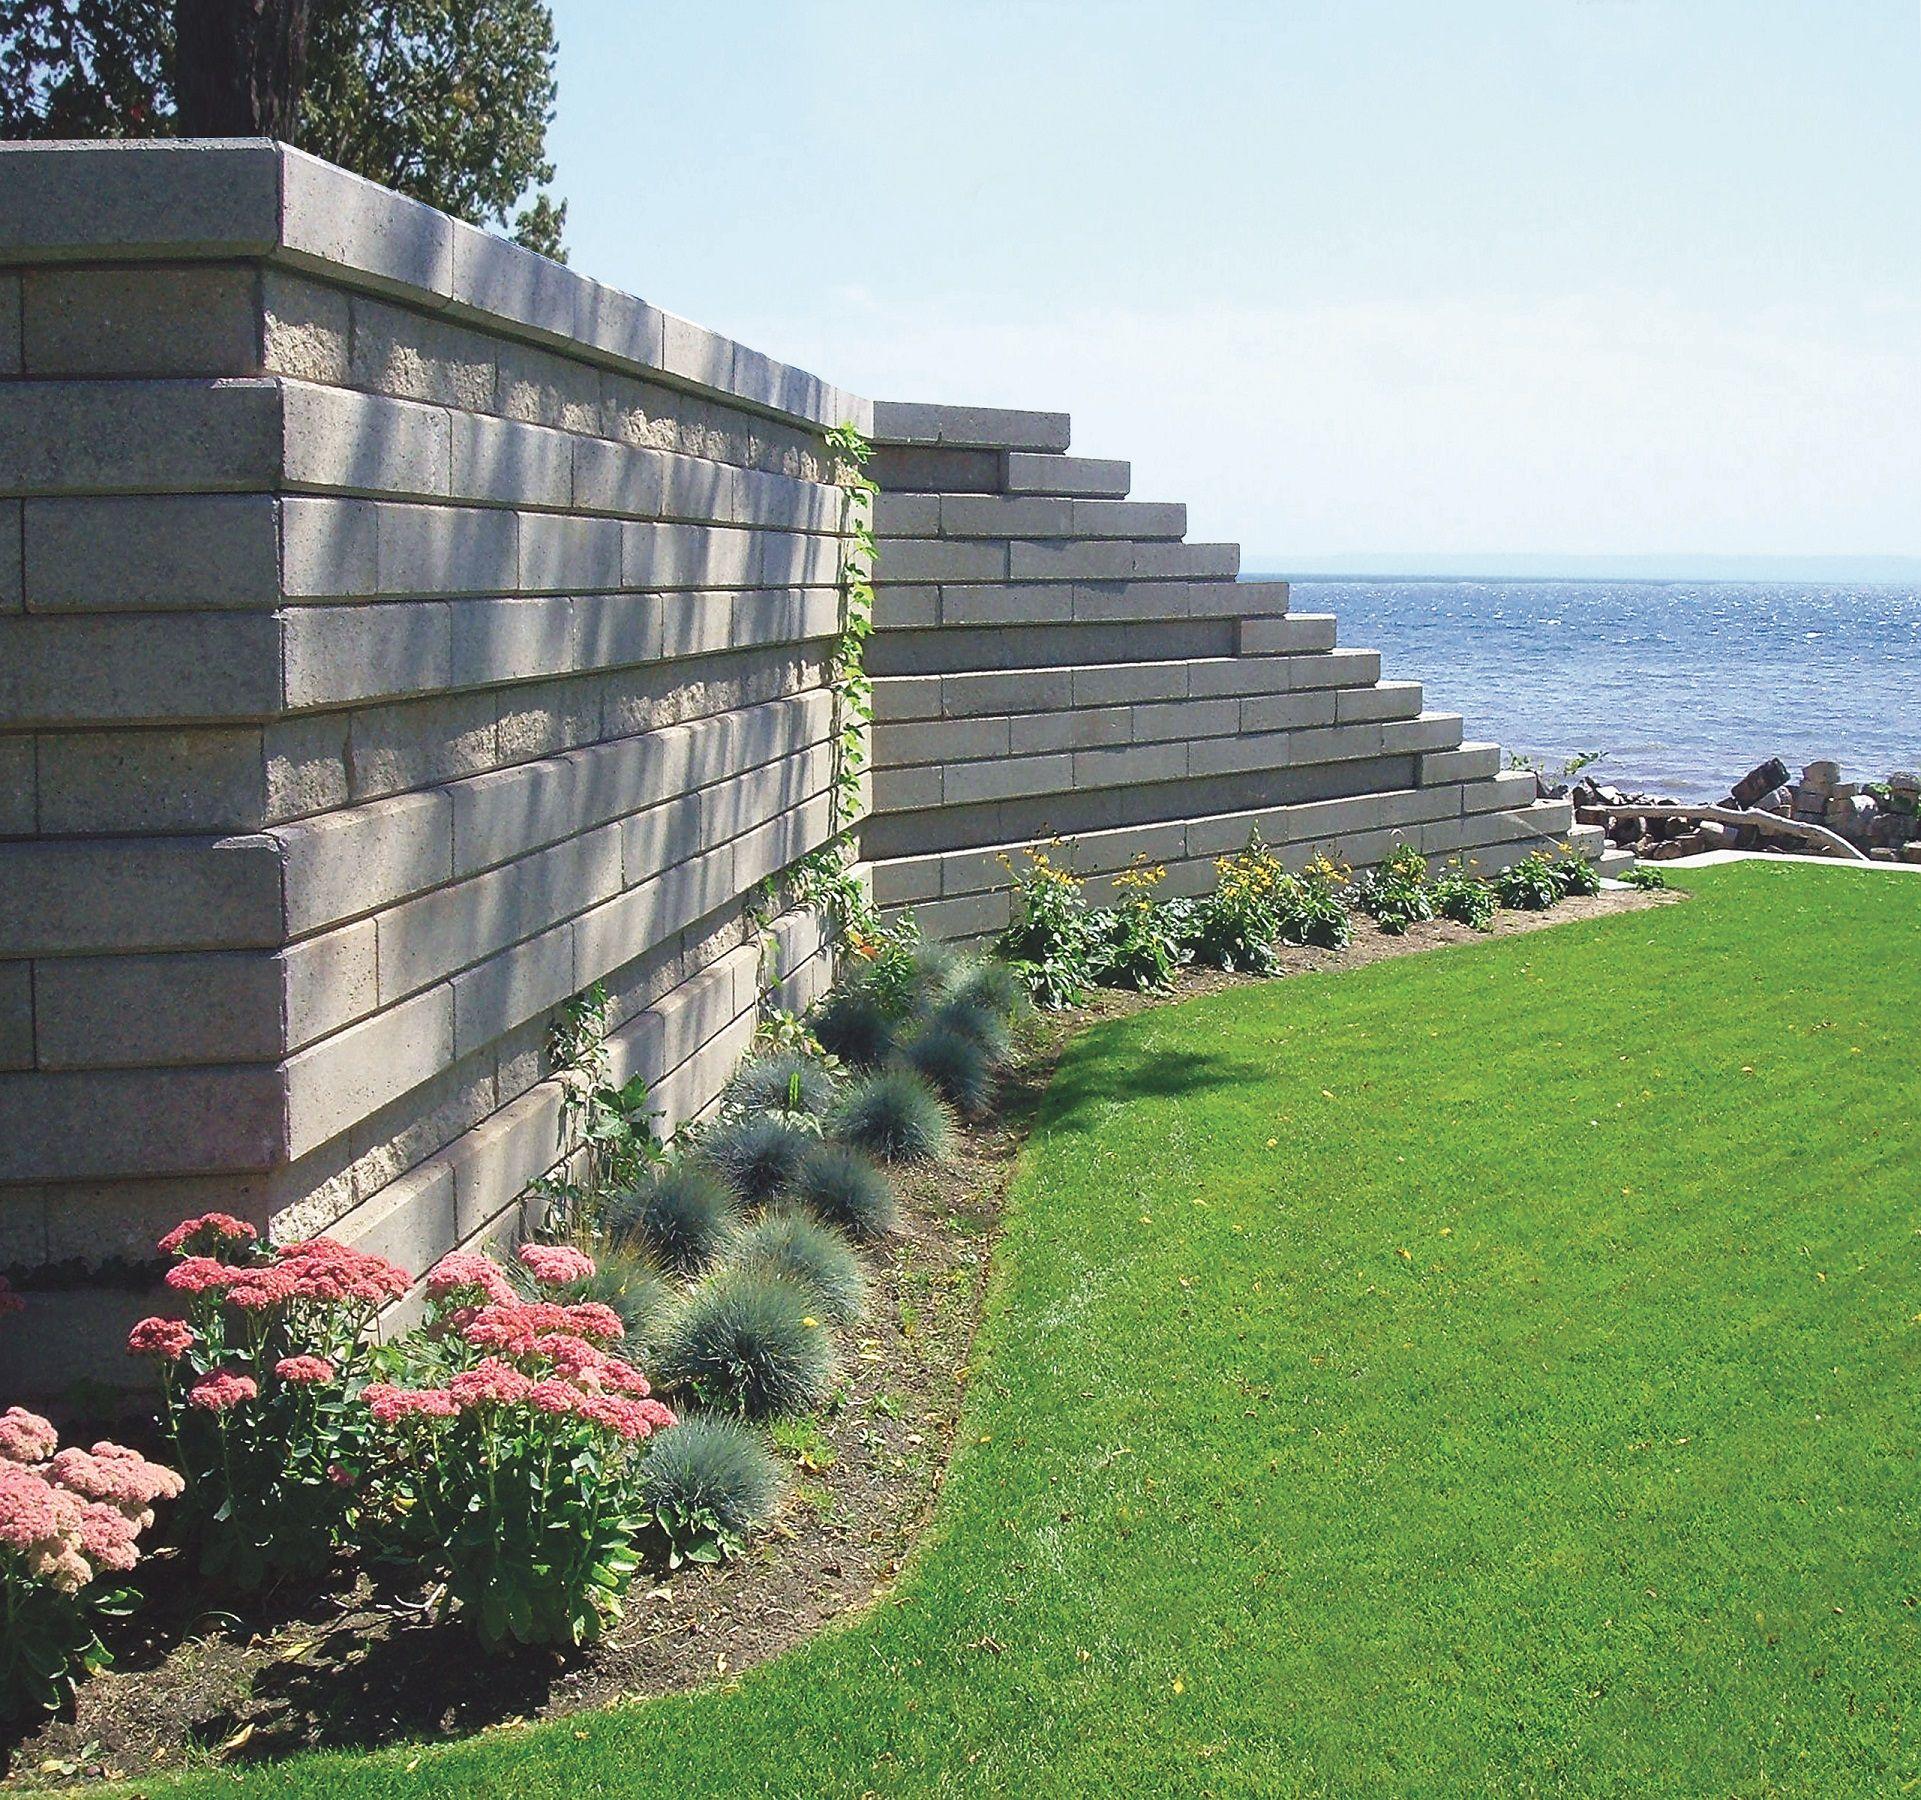 Private Residence Burlington Ontario Canada Grande Segmental Retaining Wall System Wall Systems Landscape Design Pool House